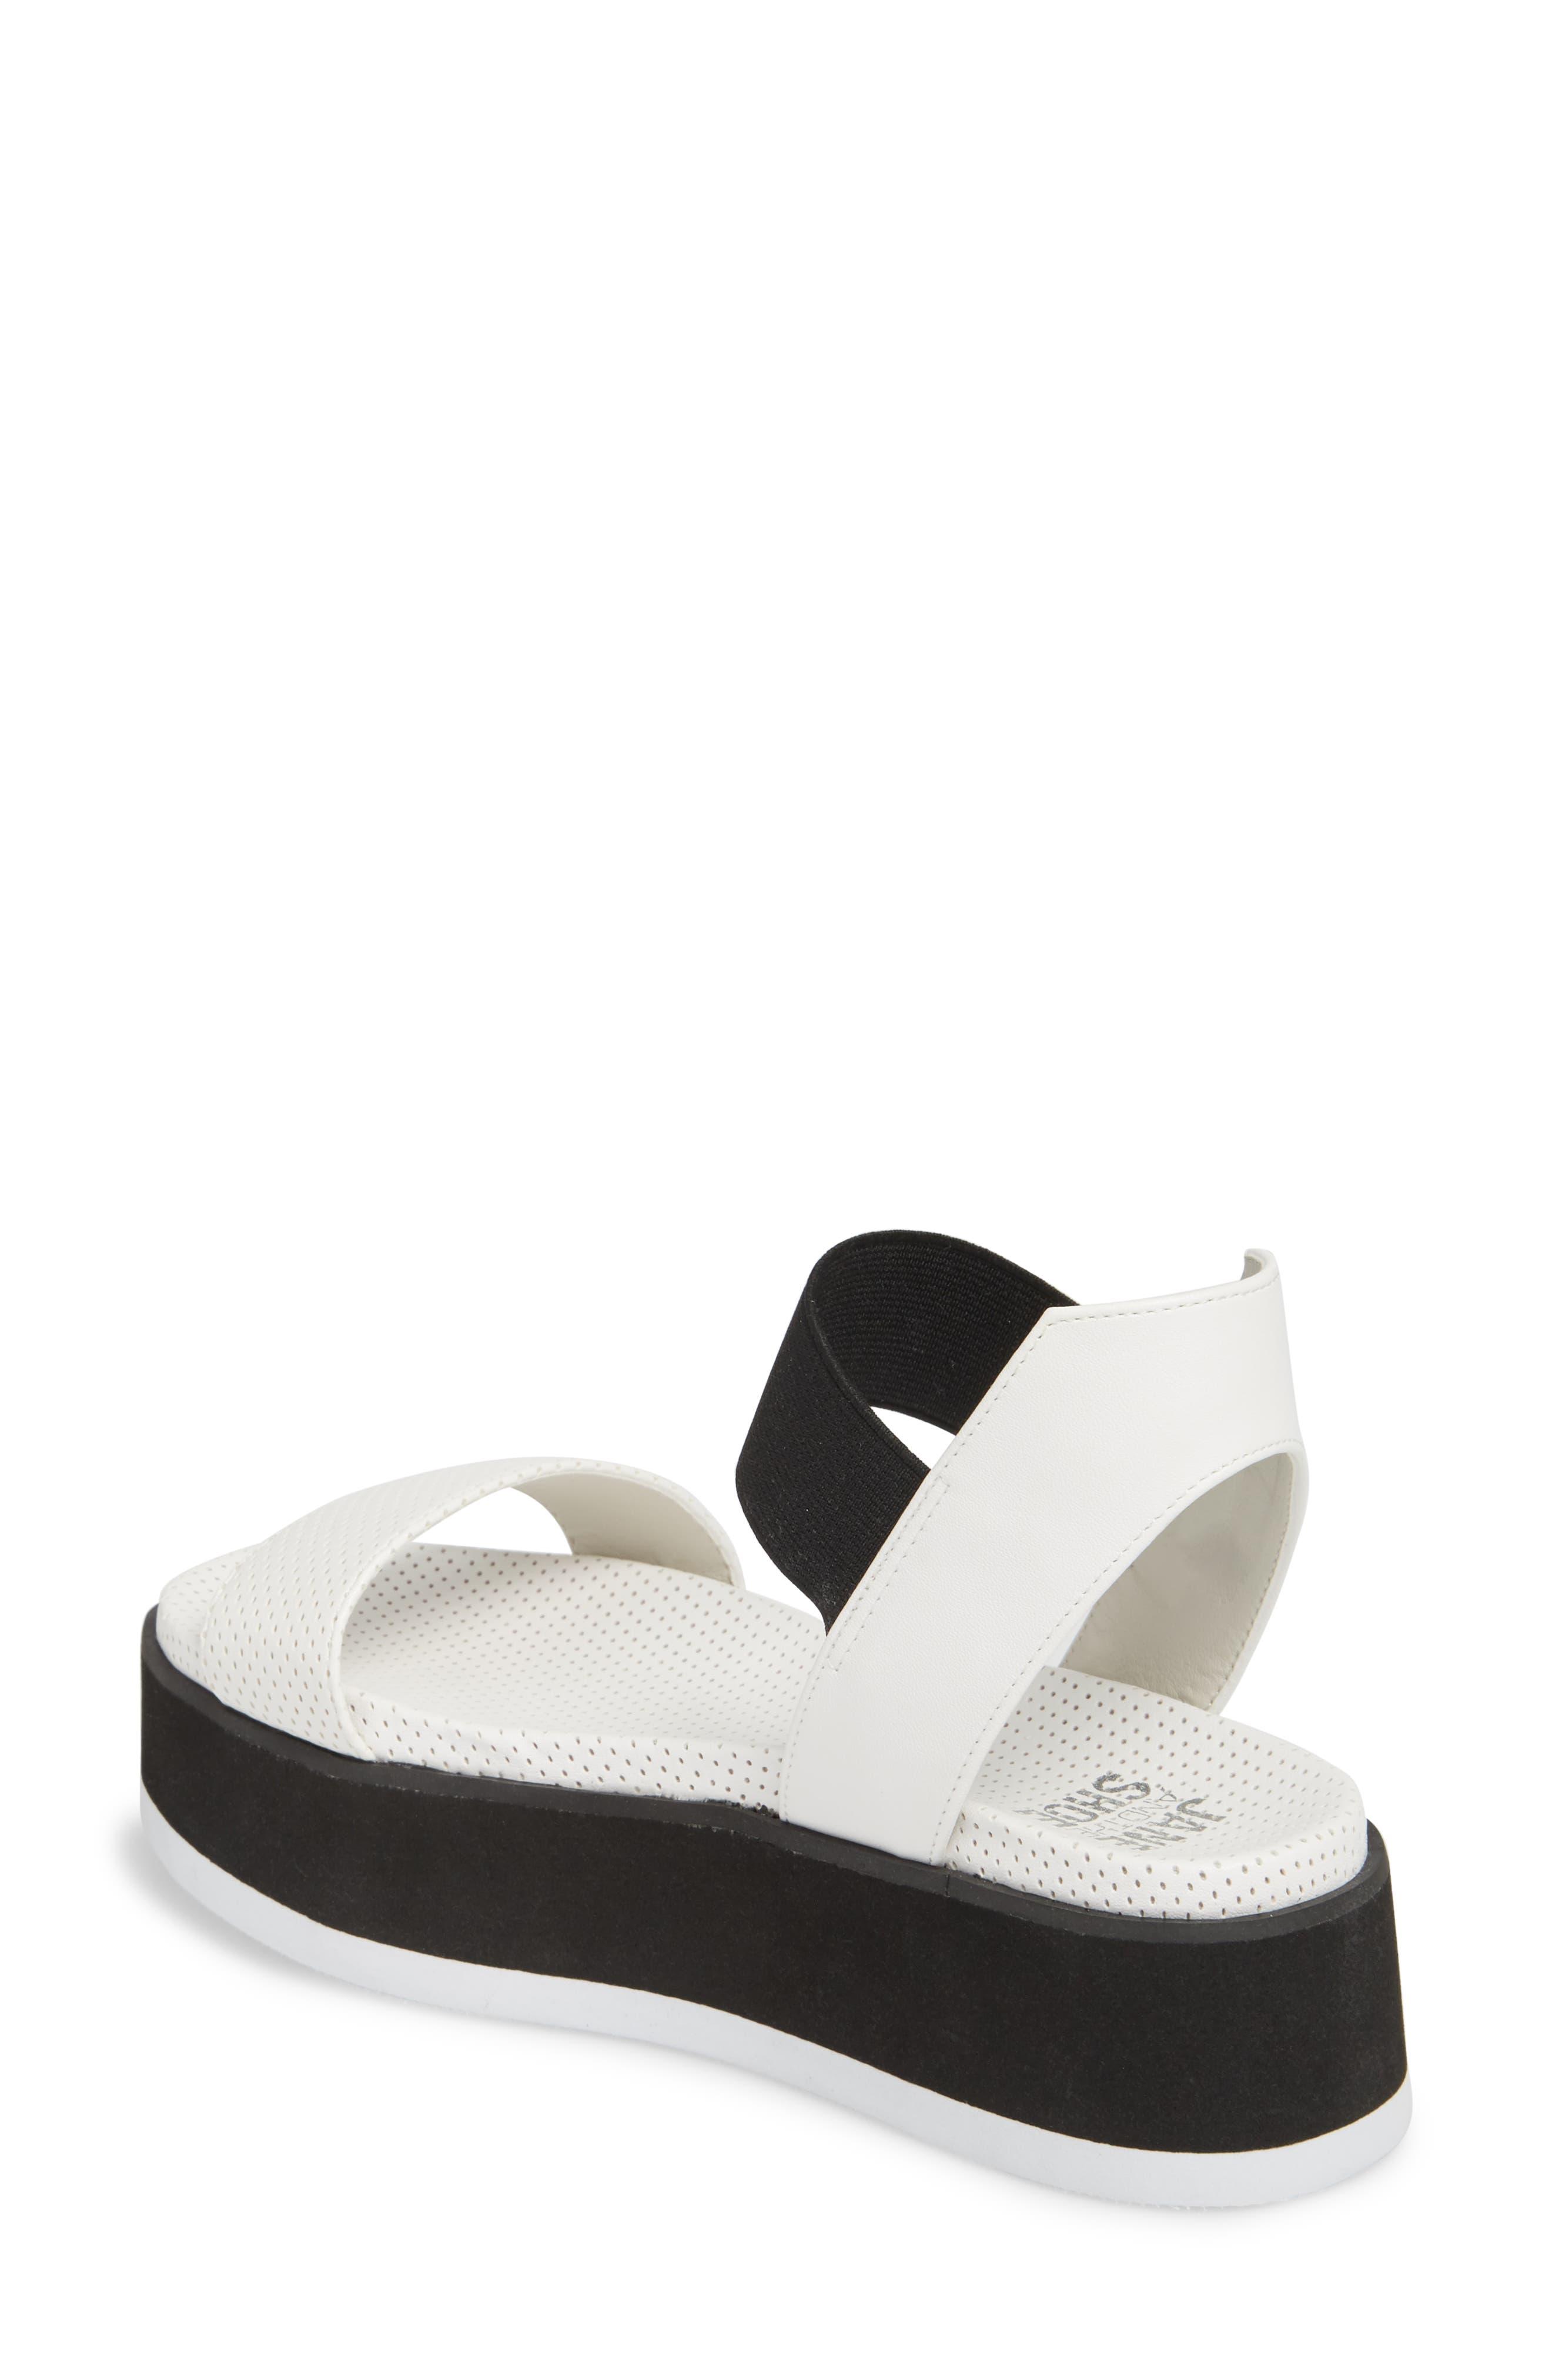 Josie Perforated Platform Sandal,                             Alternate thumbnail 2, color,                             White